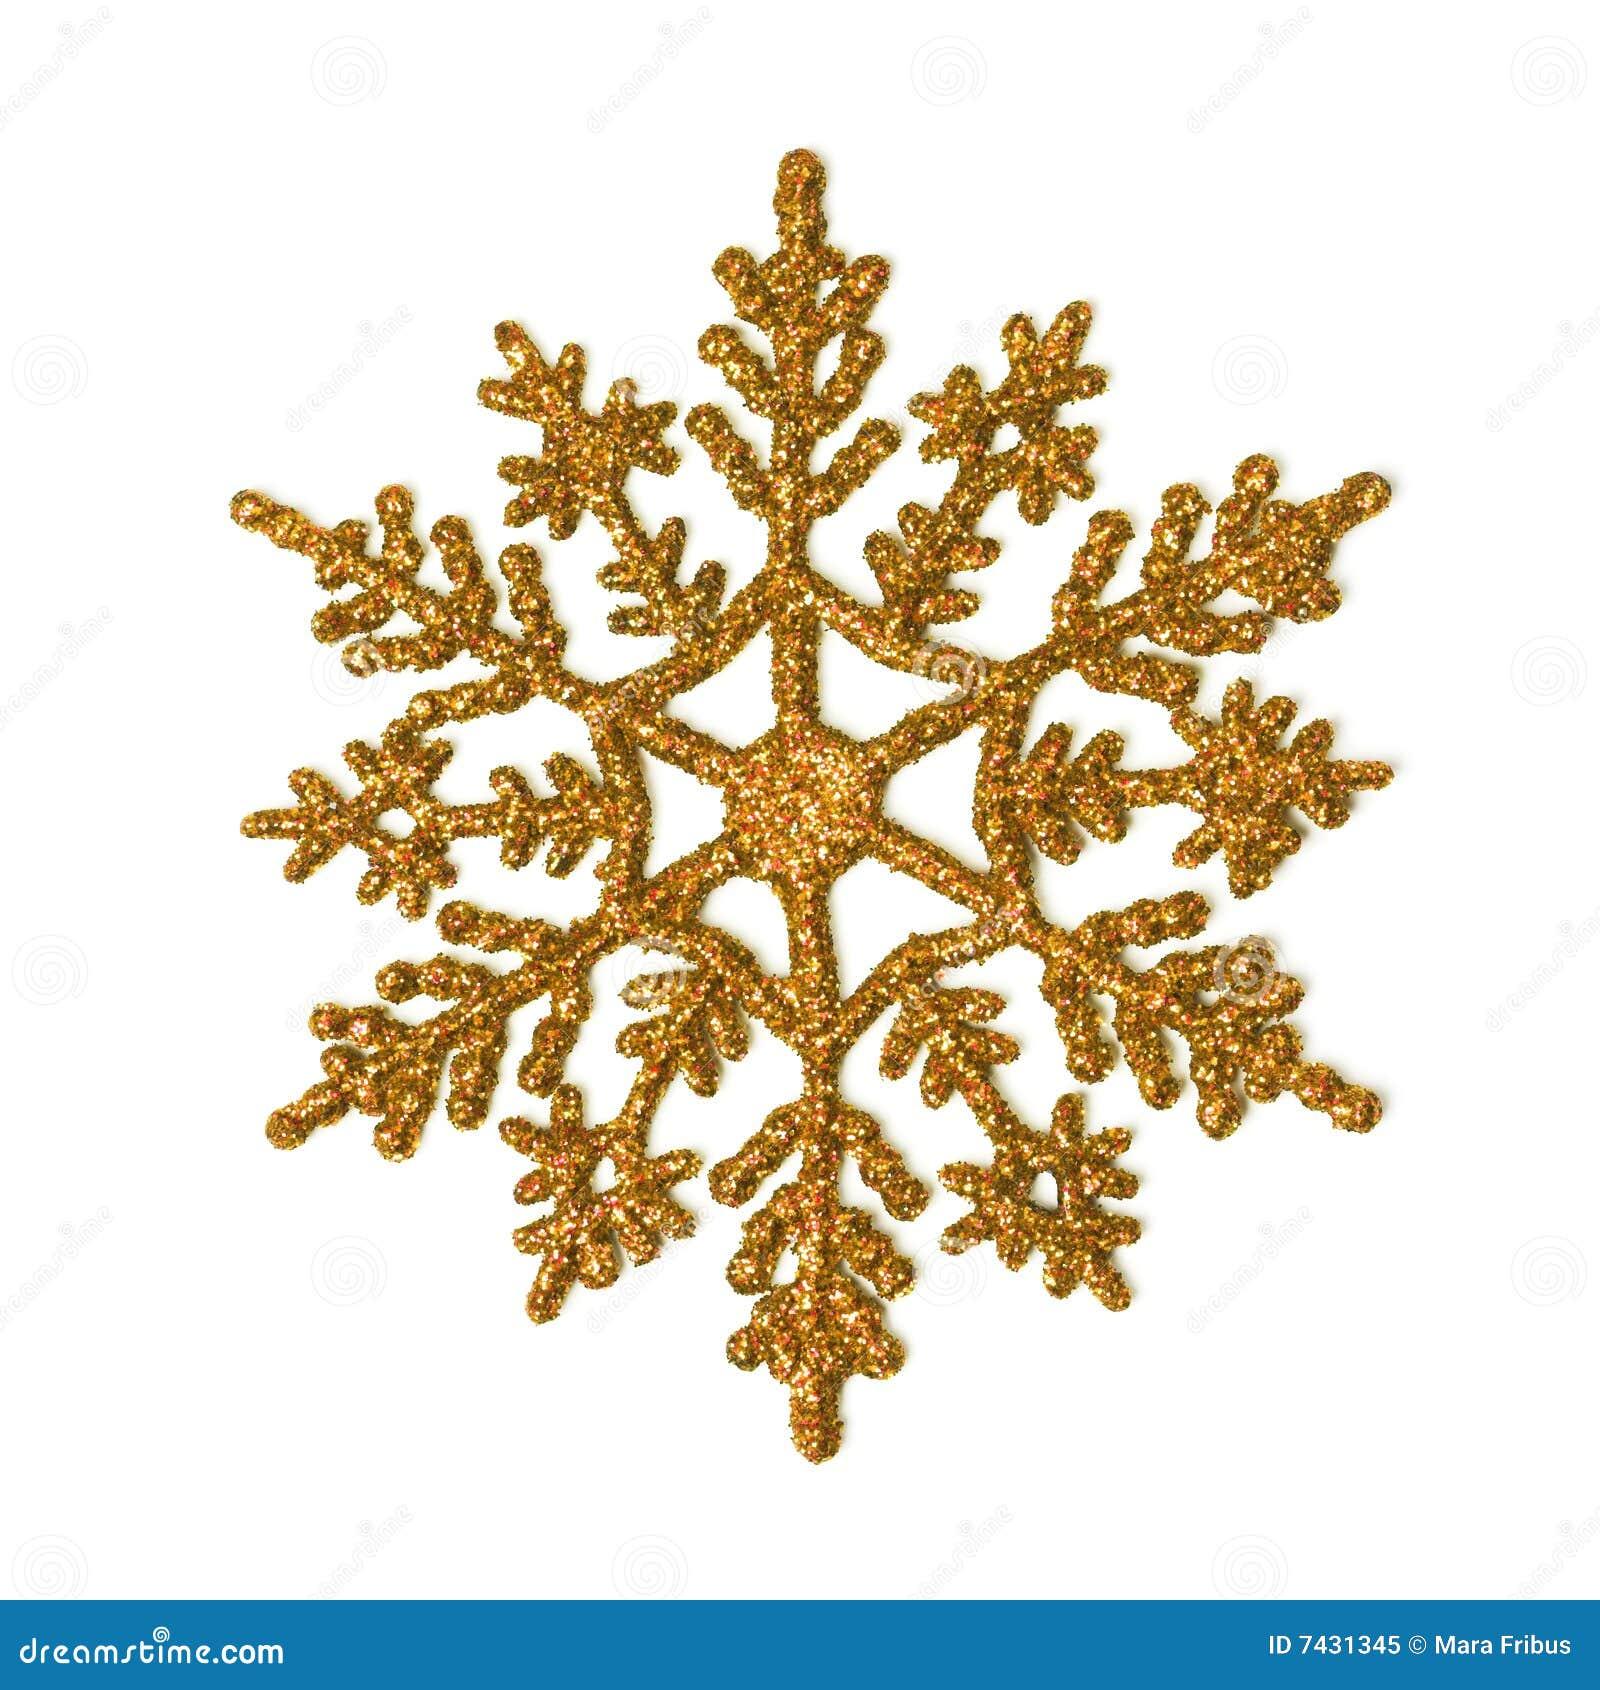 Italian handwritten postcard letter stock photo image 39254147 - Gold Glitter Snowflake Royalty Free Stock Photo Image 7431345